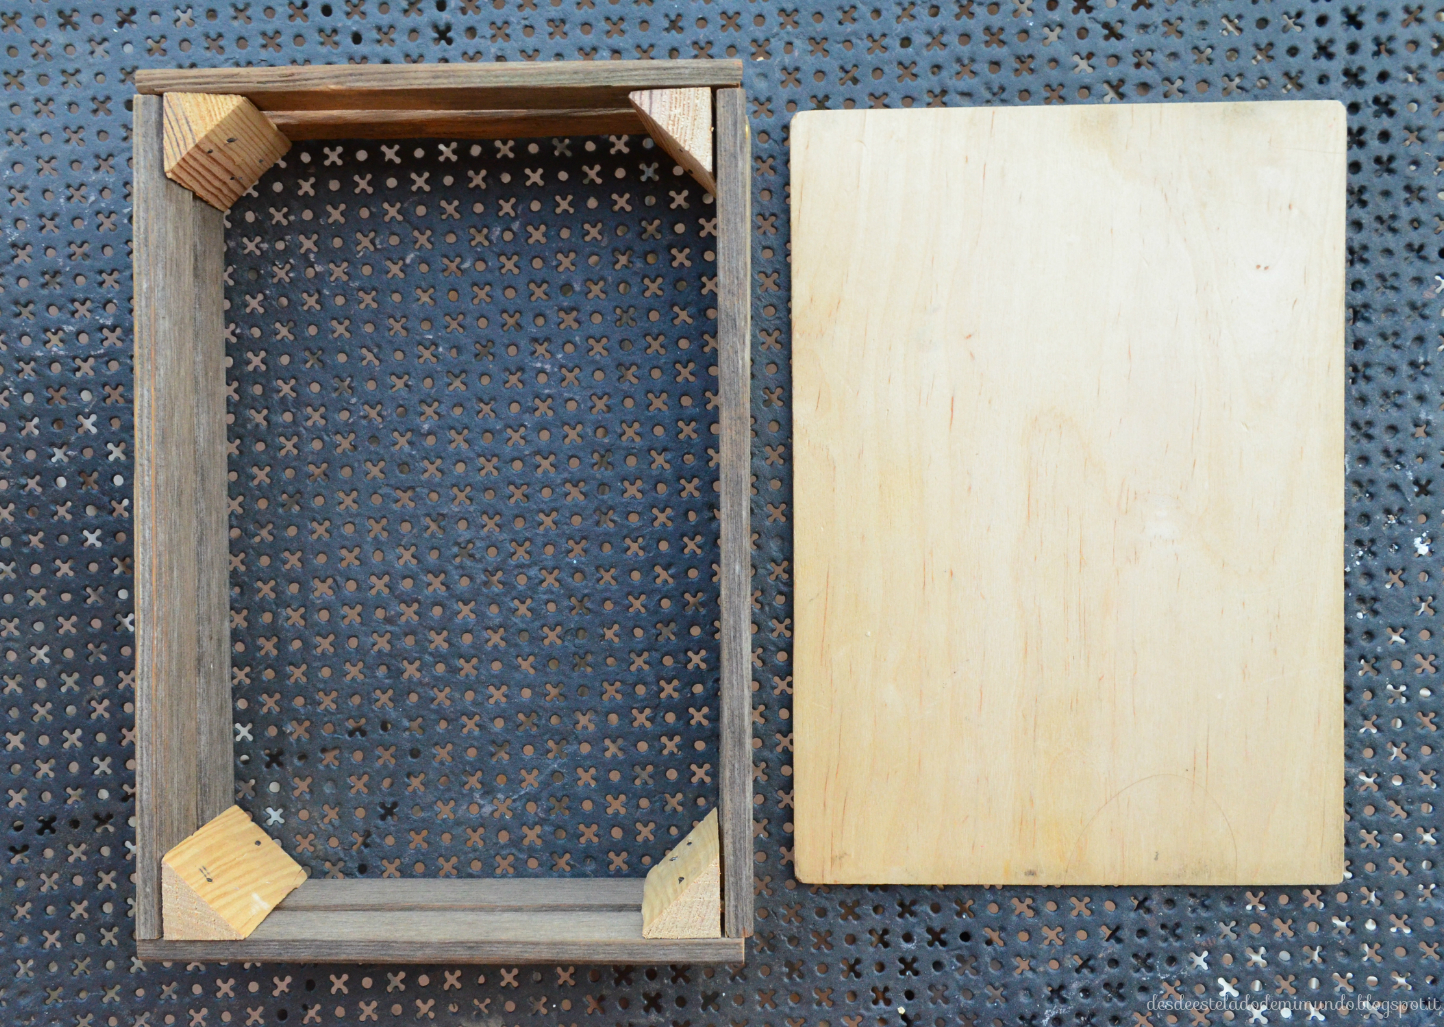 rustic wooden tray desdeesteladodemimundo.blogspot.it